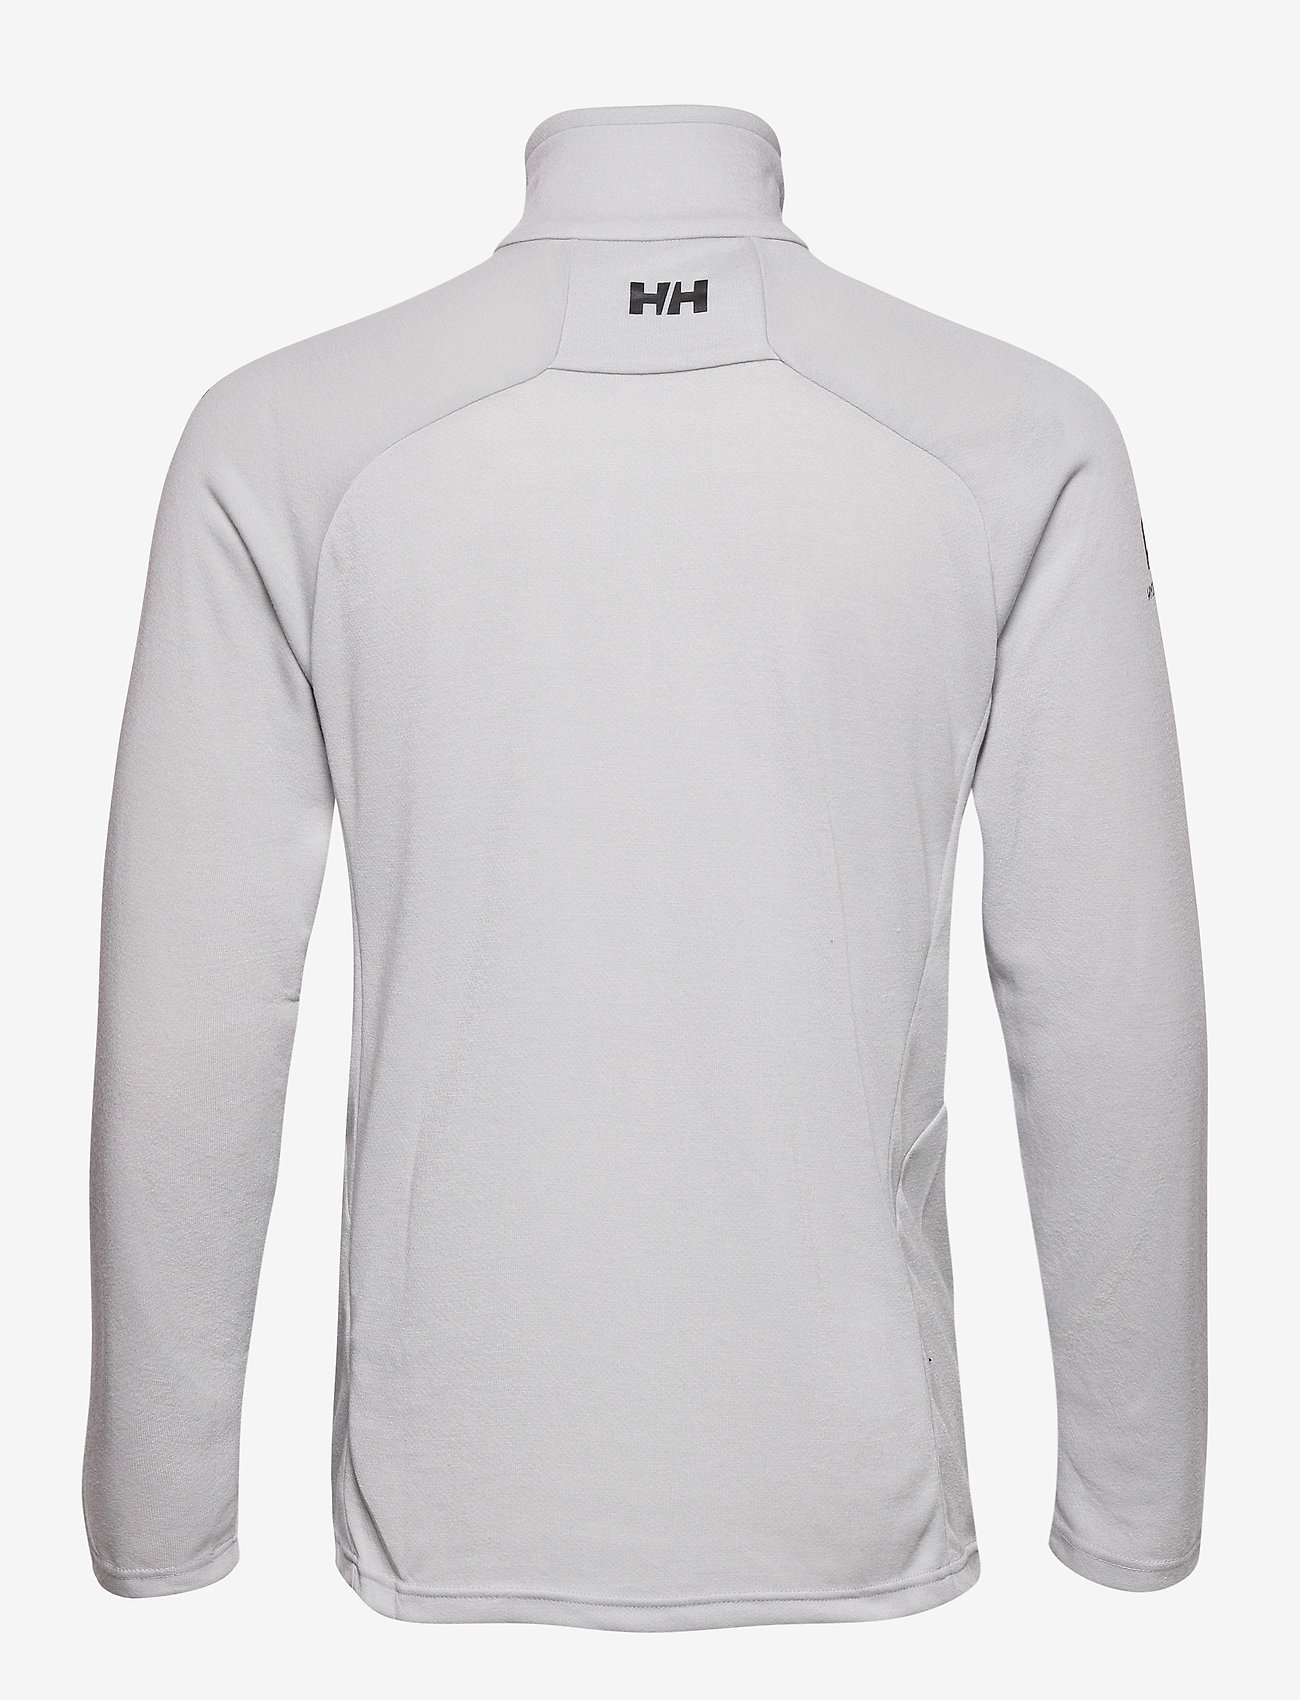 Helly Hansen HP 1/2 ZIP PULLOVER - Innerlag GREY FOG - Menn Klær